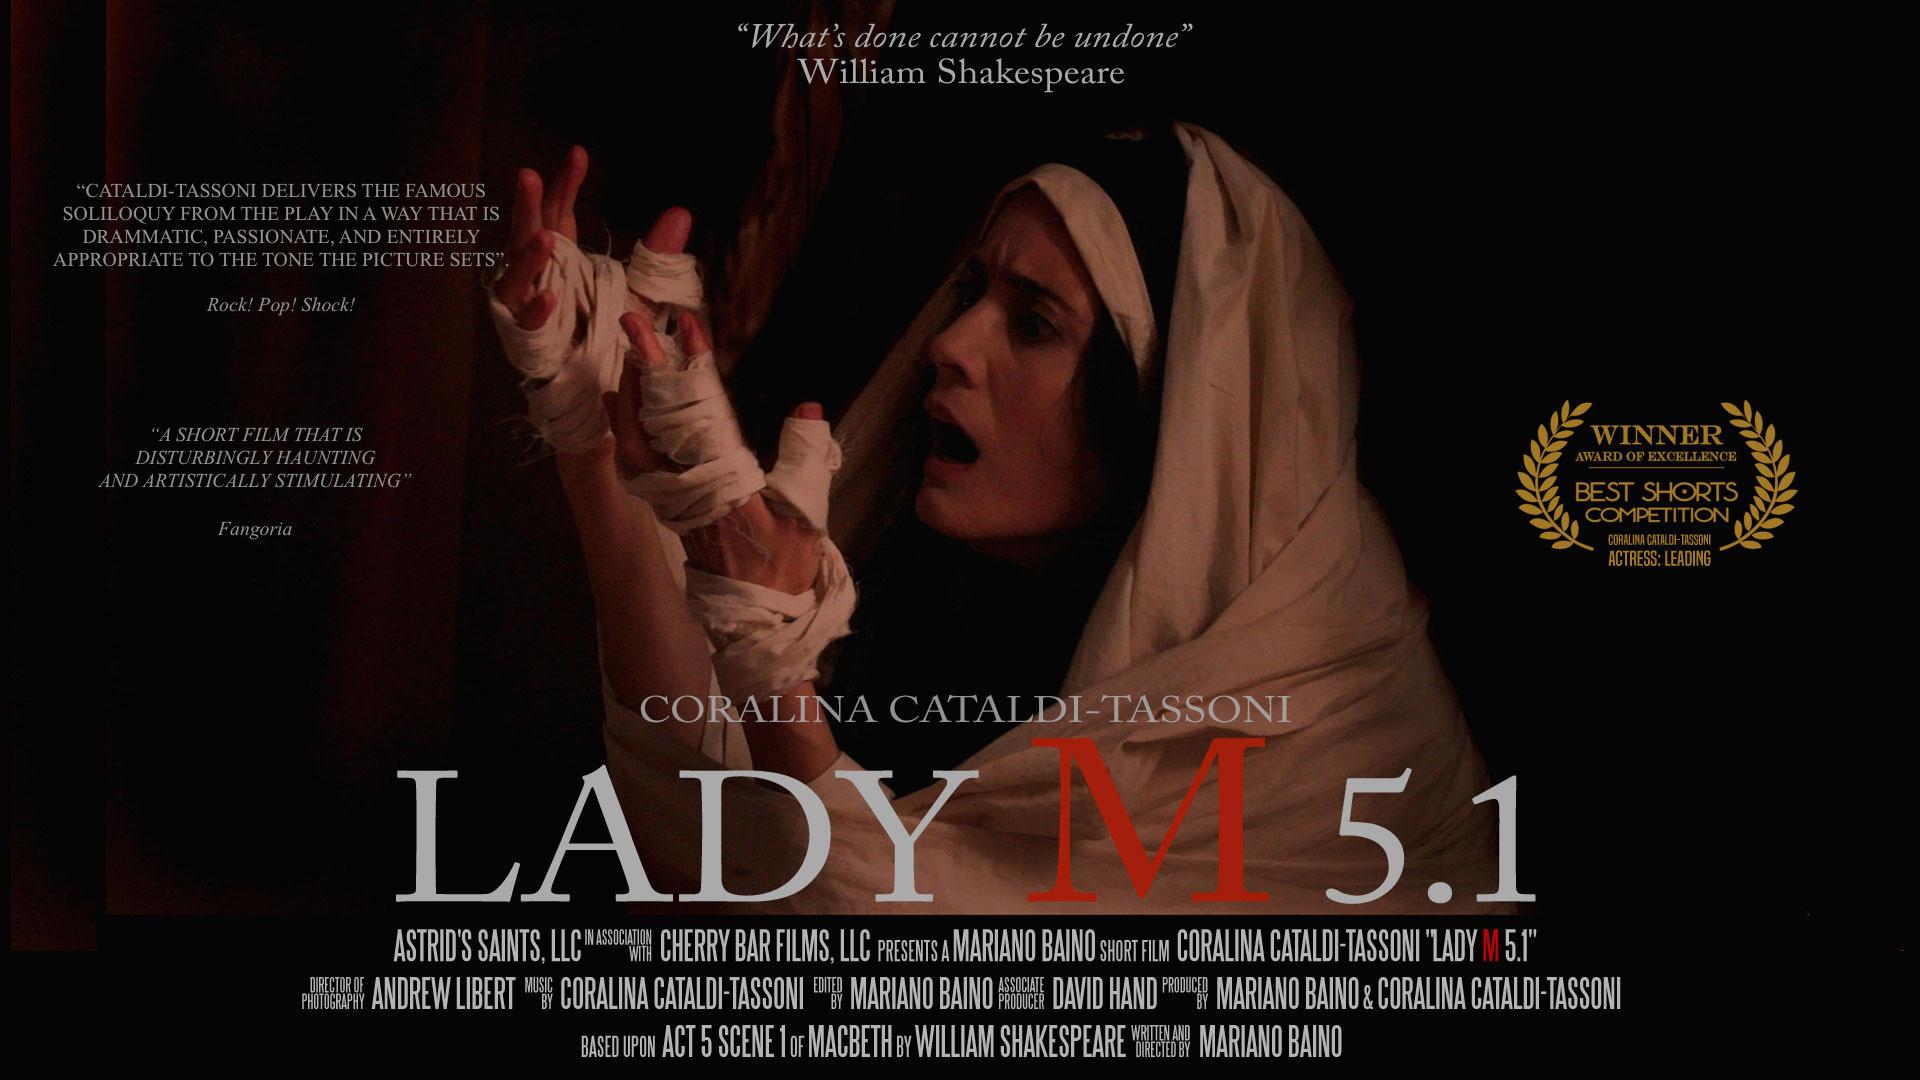 LADY M 5.1 Poster.jpg